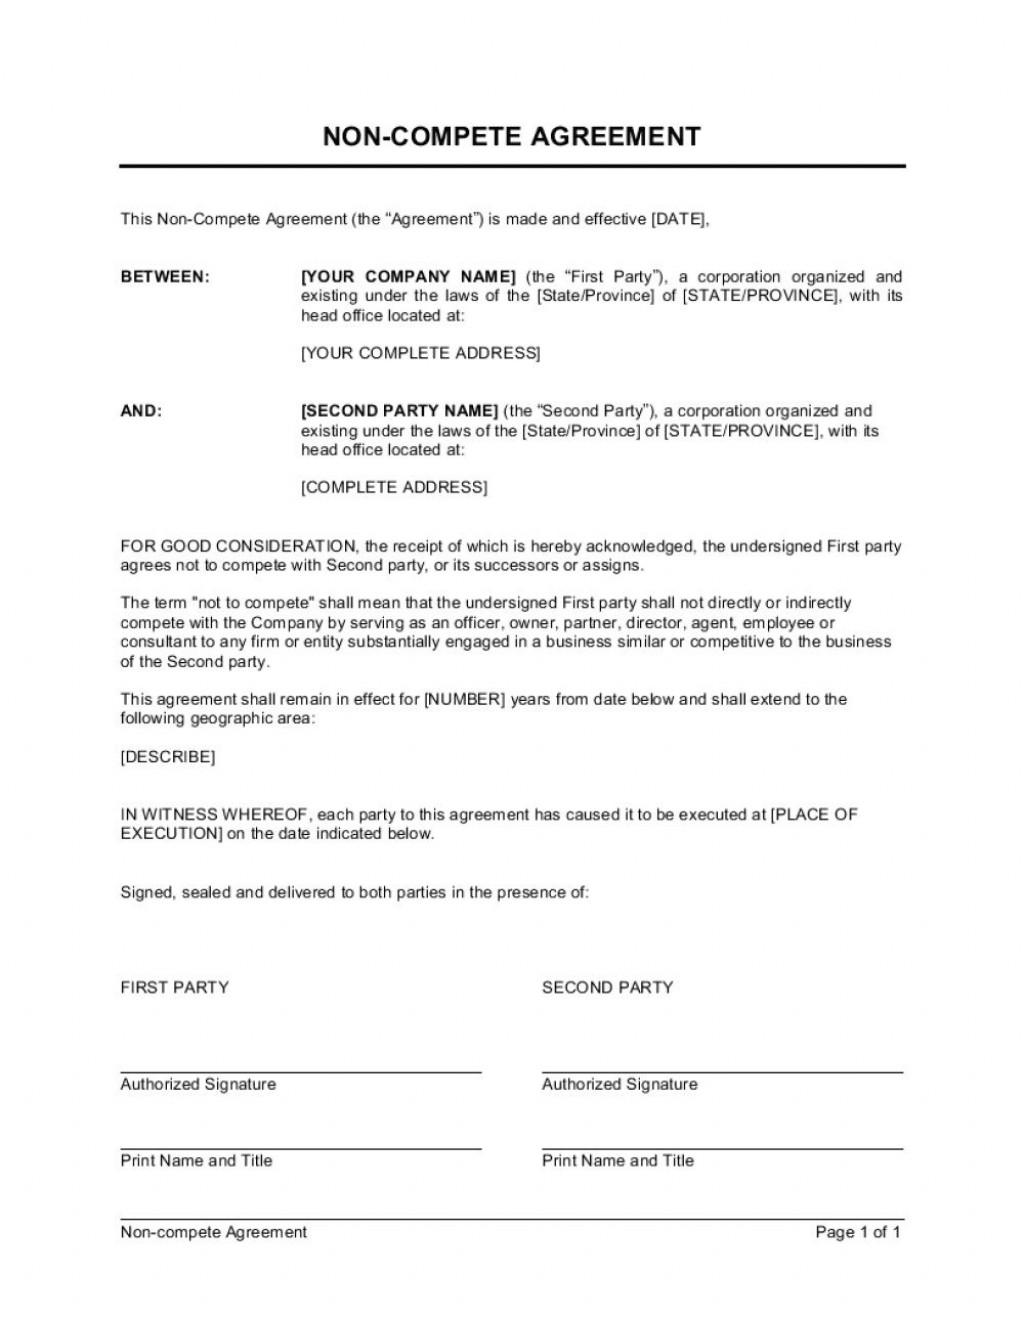 001 Wonderful Non Compete Agreement Template Idea  Sample India Free FloridaLarge